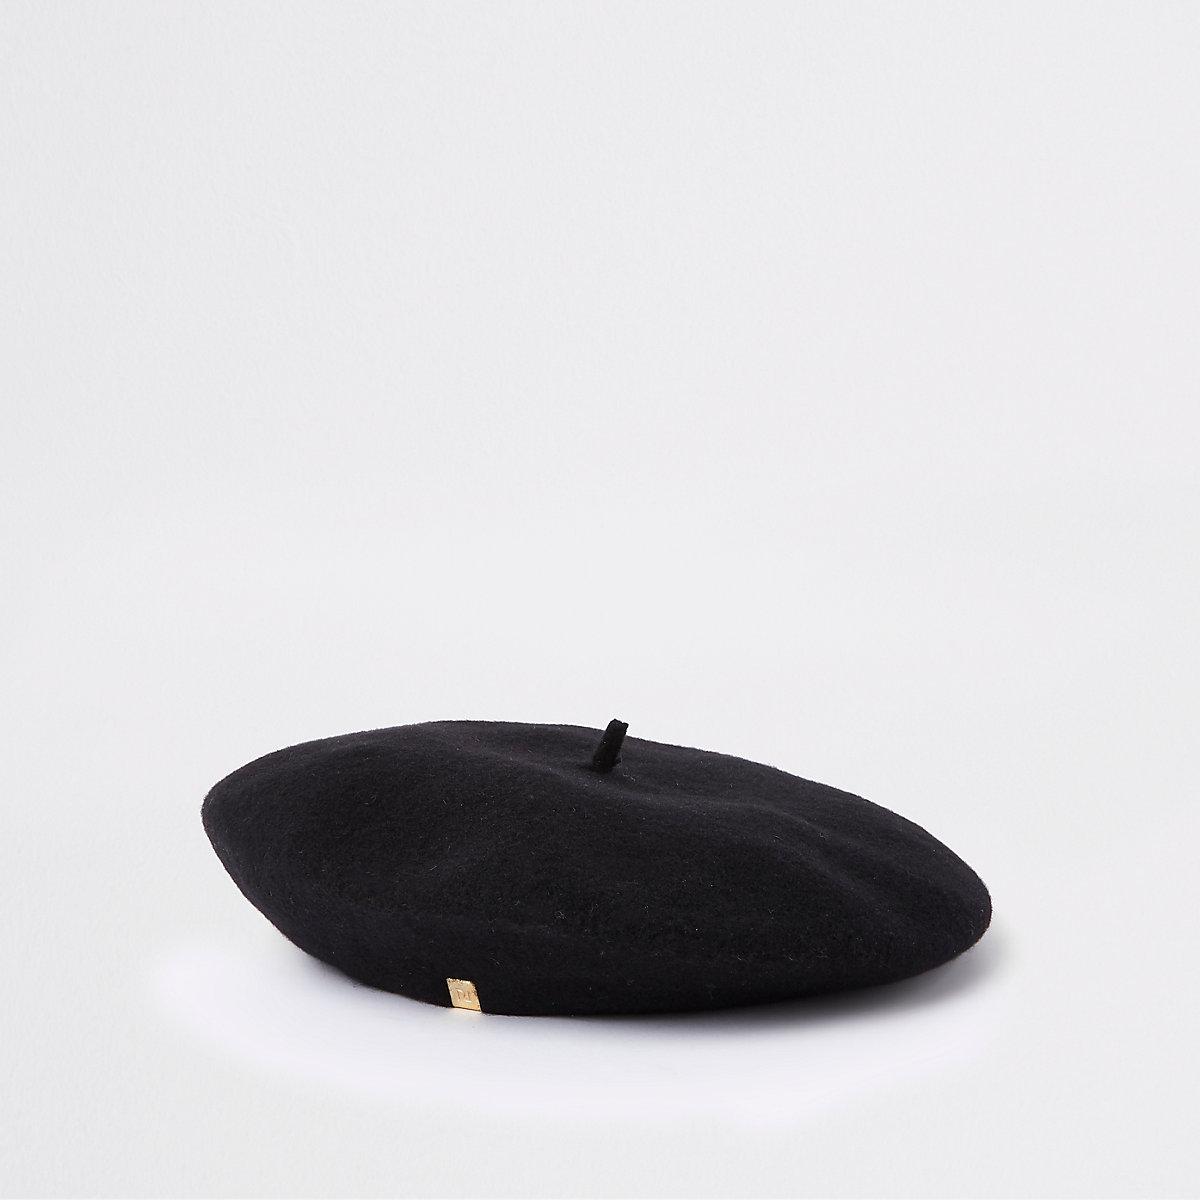 Schwarze Baskenmütze aus Filz